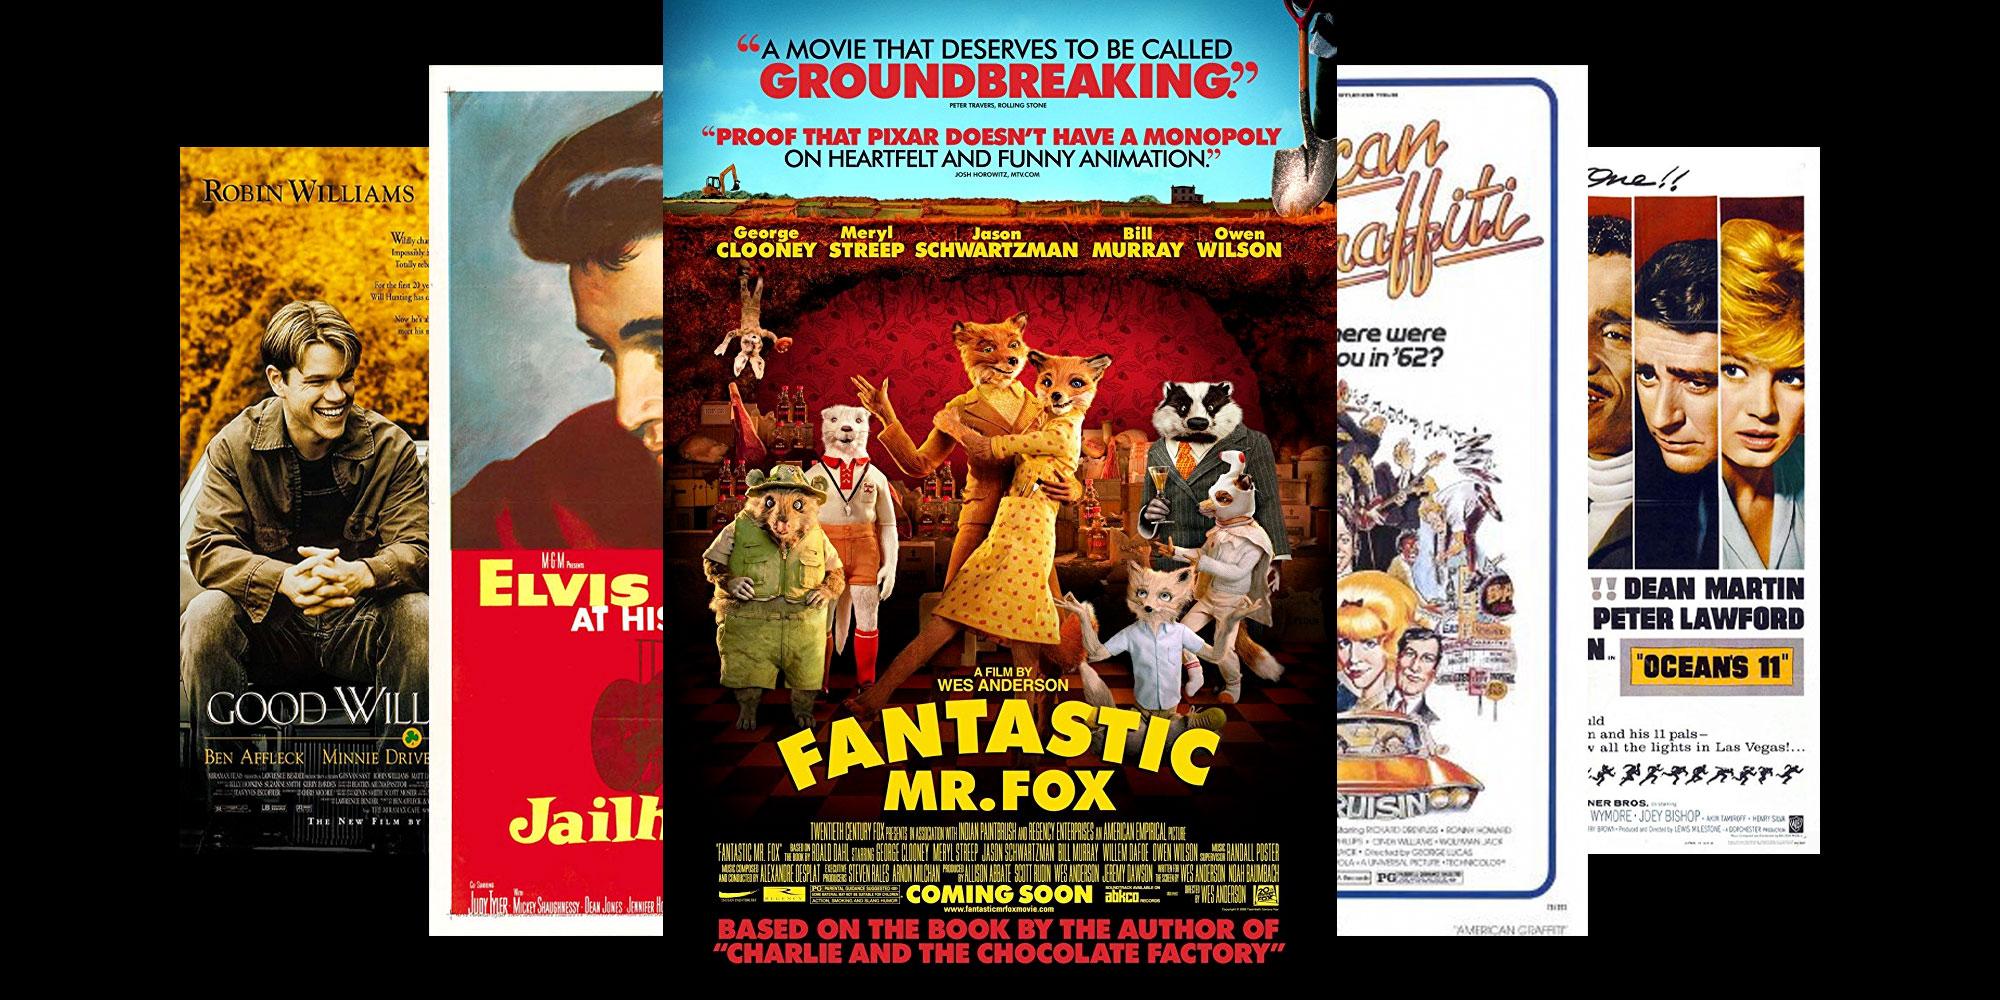 Latest $5 iTunes sale offers classic & new movies alike: Fantastic Mr. Fox, American Graffiti, more